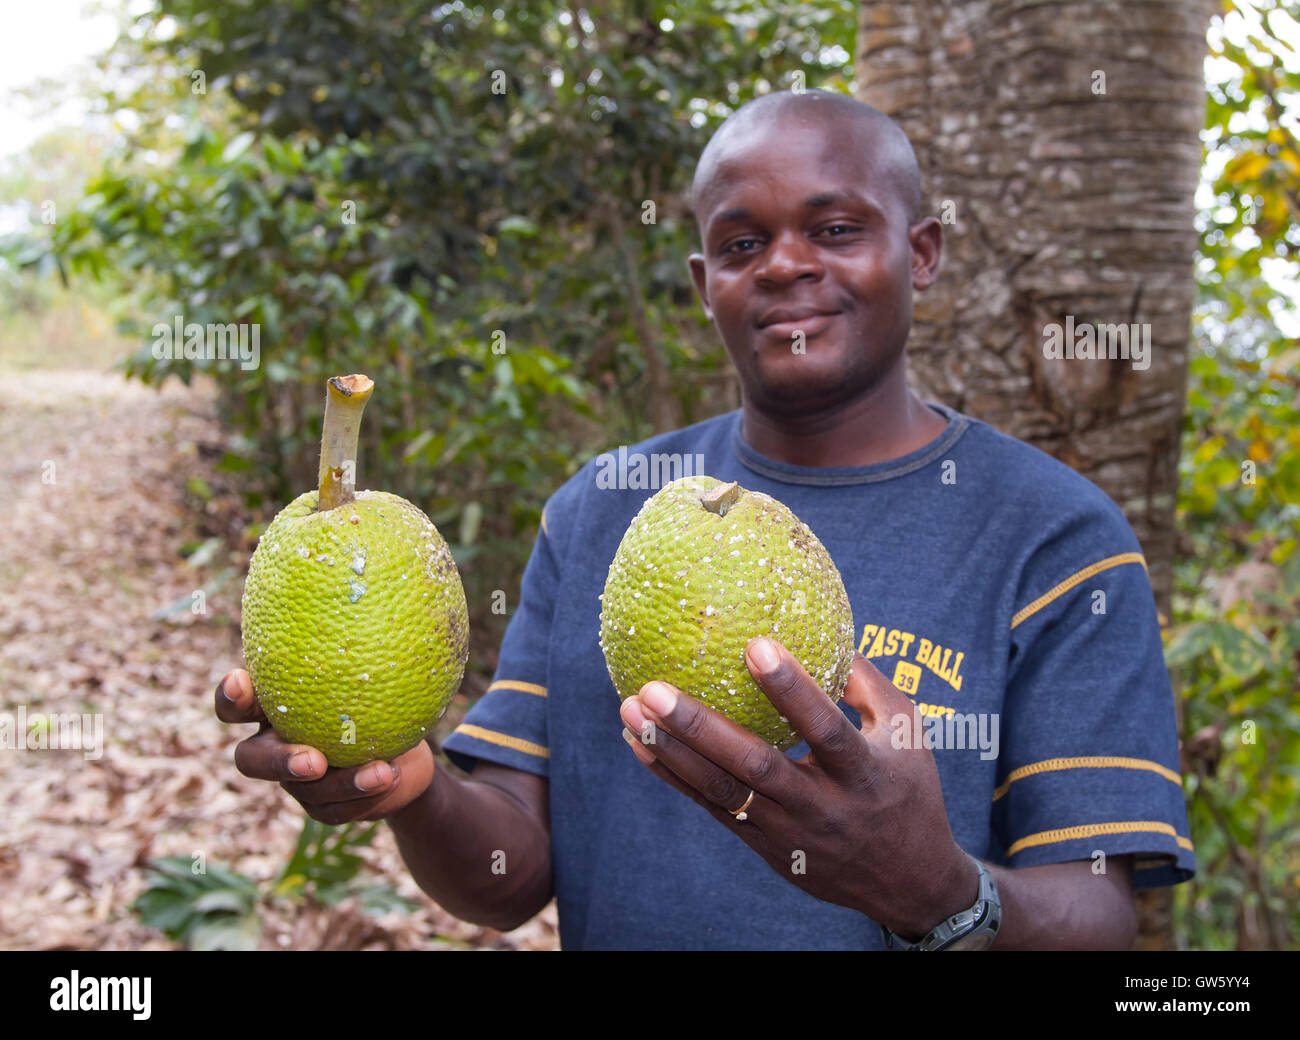 Brotfrucht, Artocarpus Altilis. Männer zeigen Früchte. São Tomé e Príncipe Stockbild